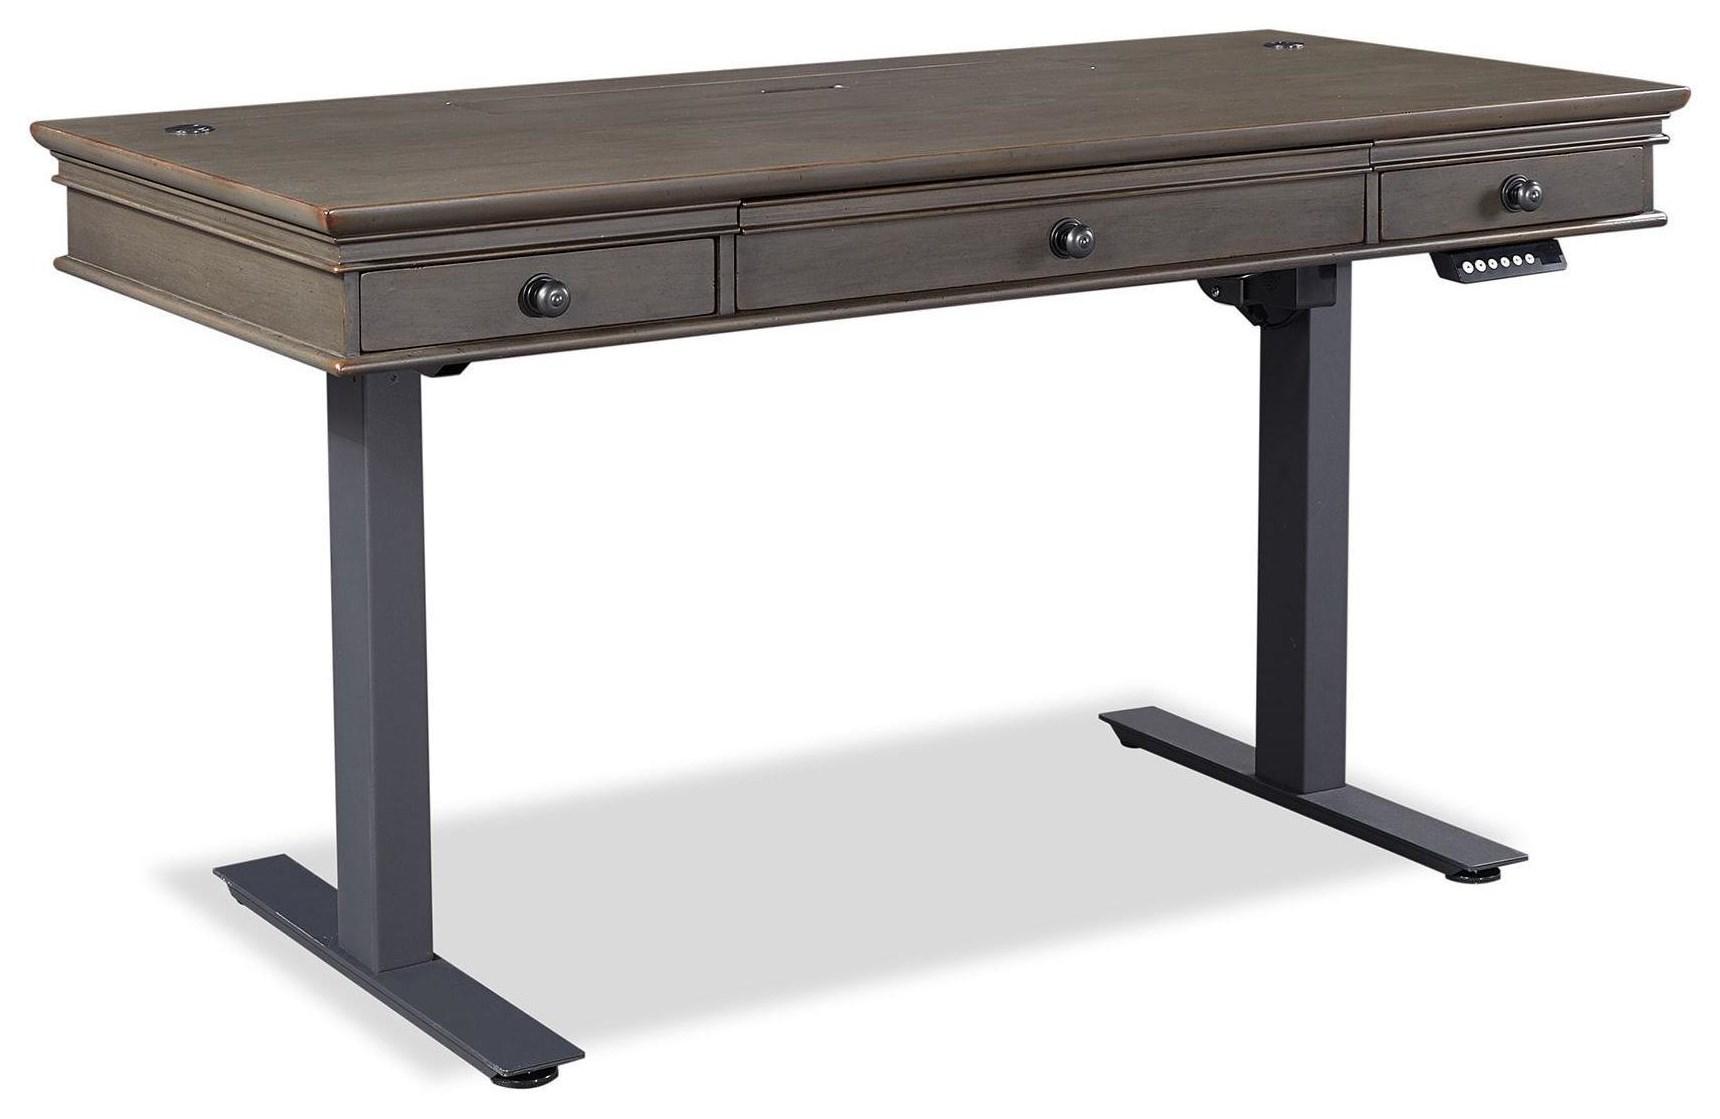 Oxford Adjustable Lift Desk by Birch Home at Sprintz Furniture